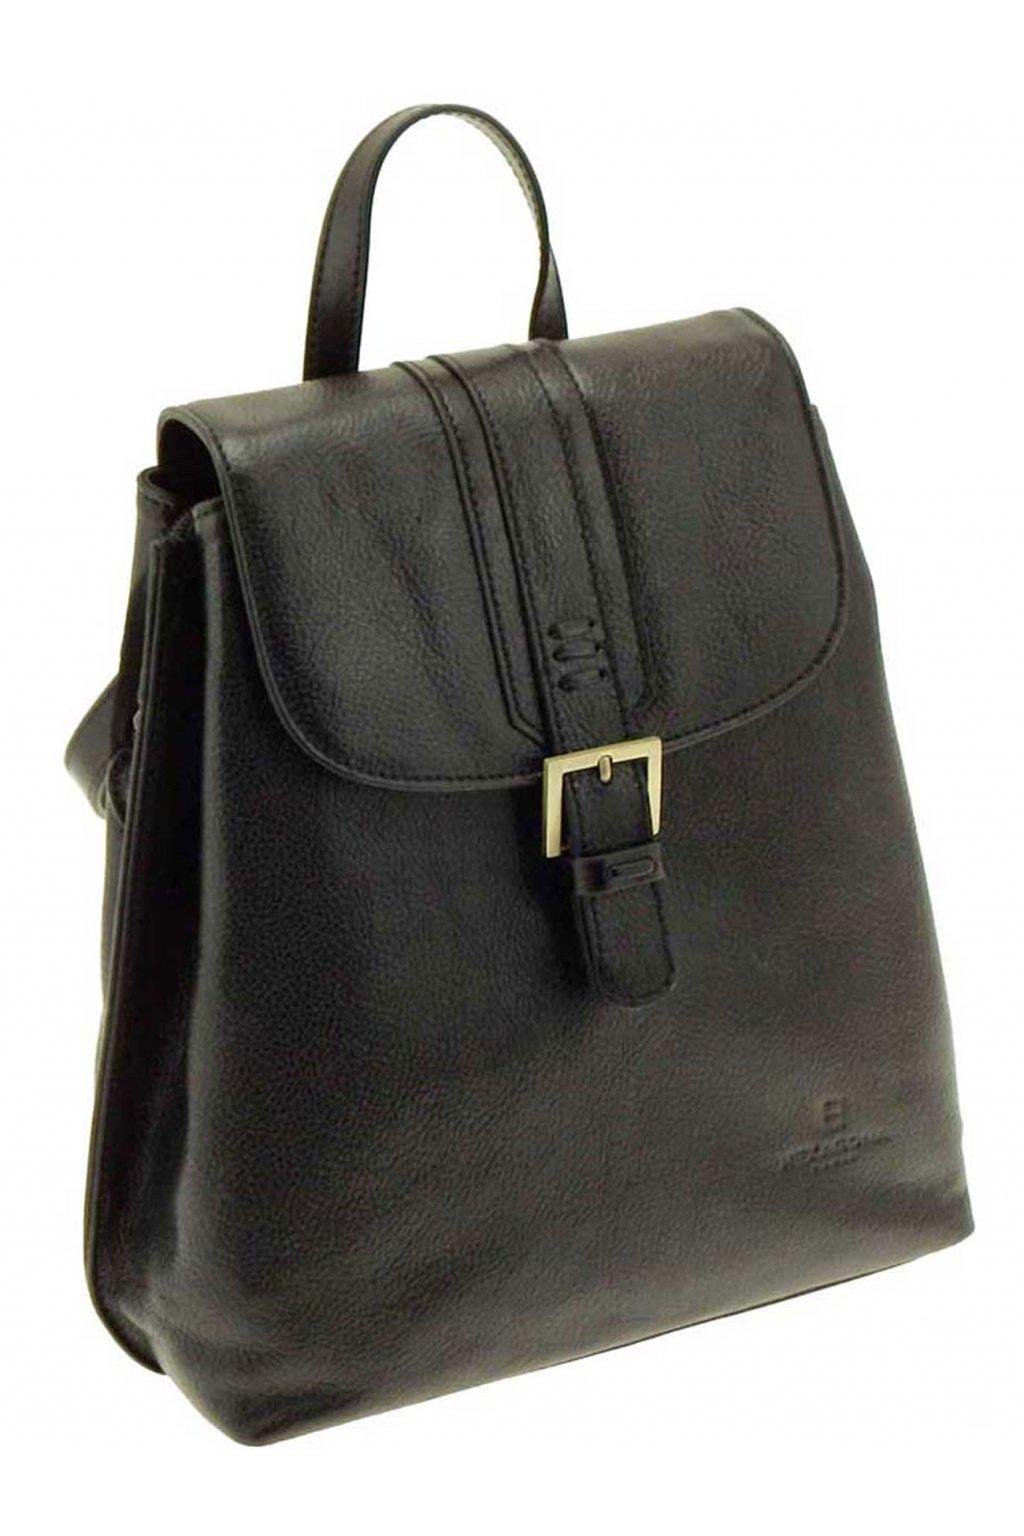 Damský batoh kožený DBK03 112194 C